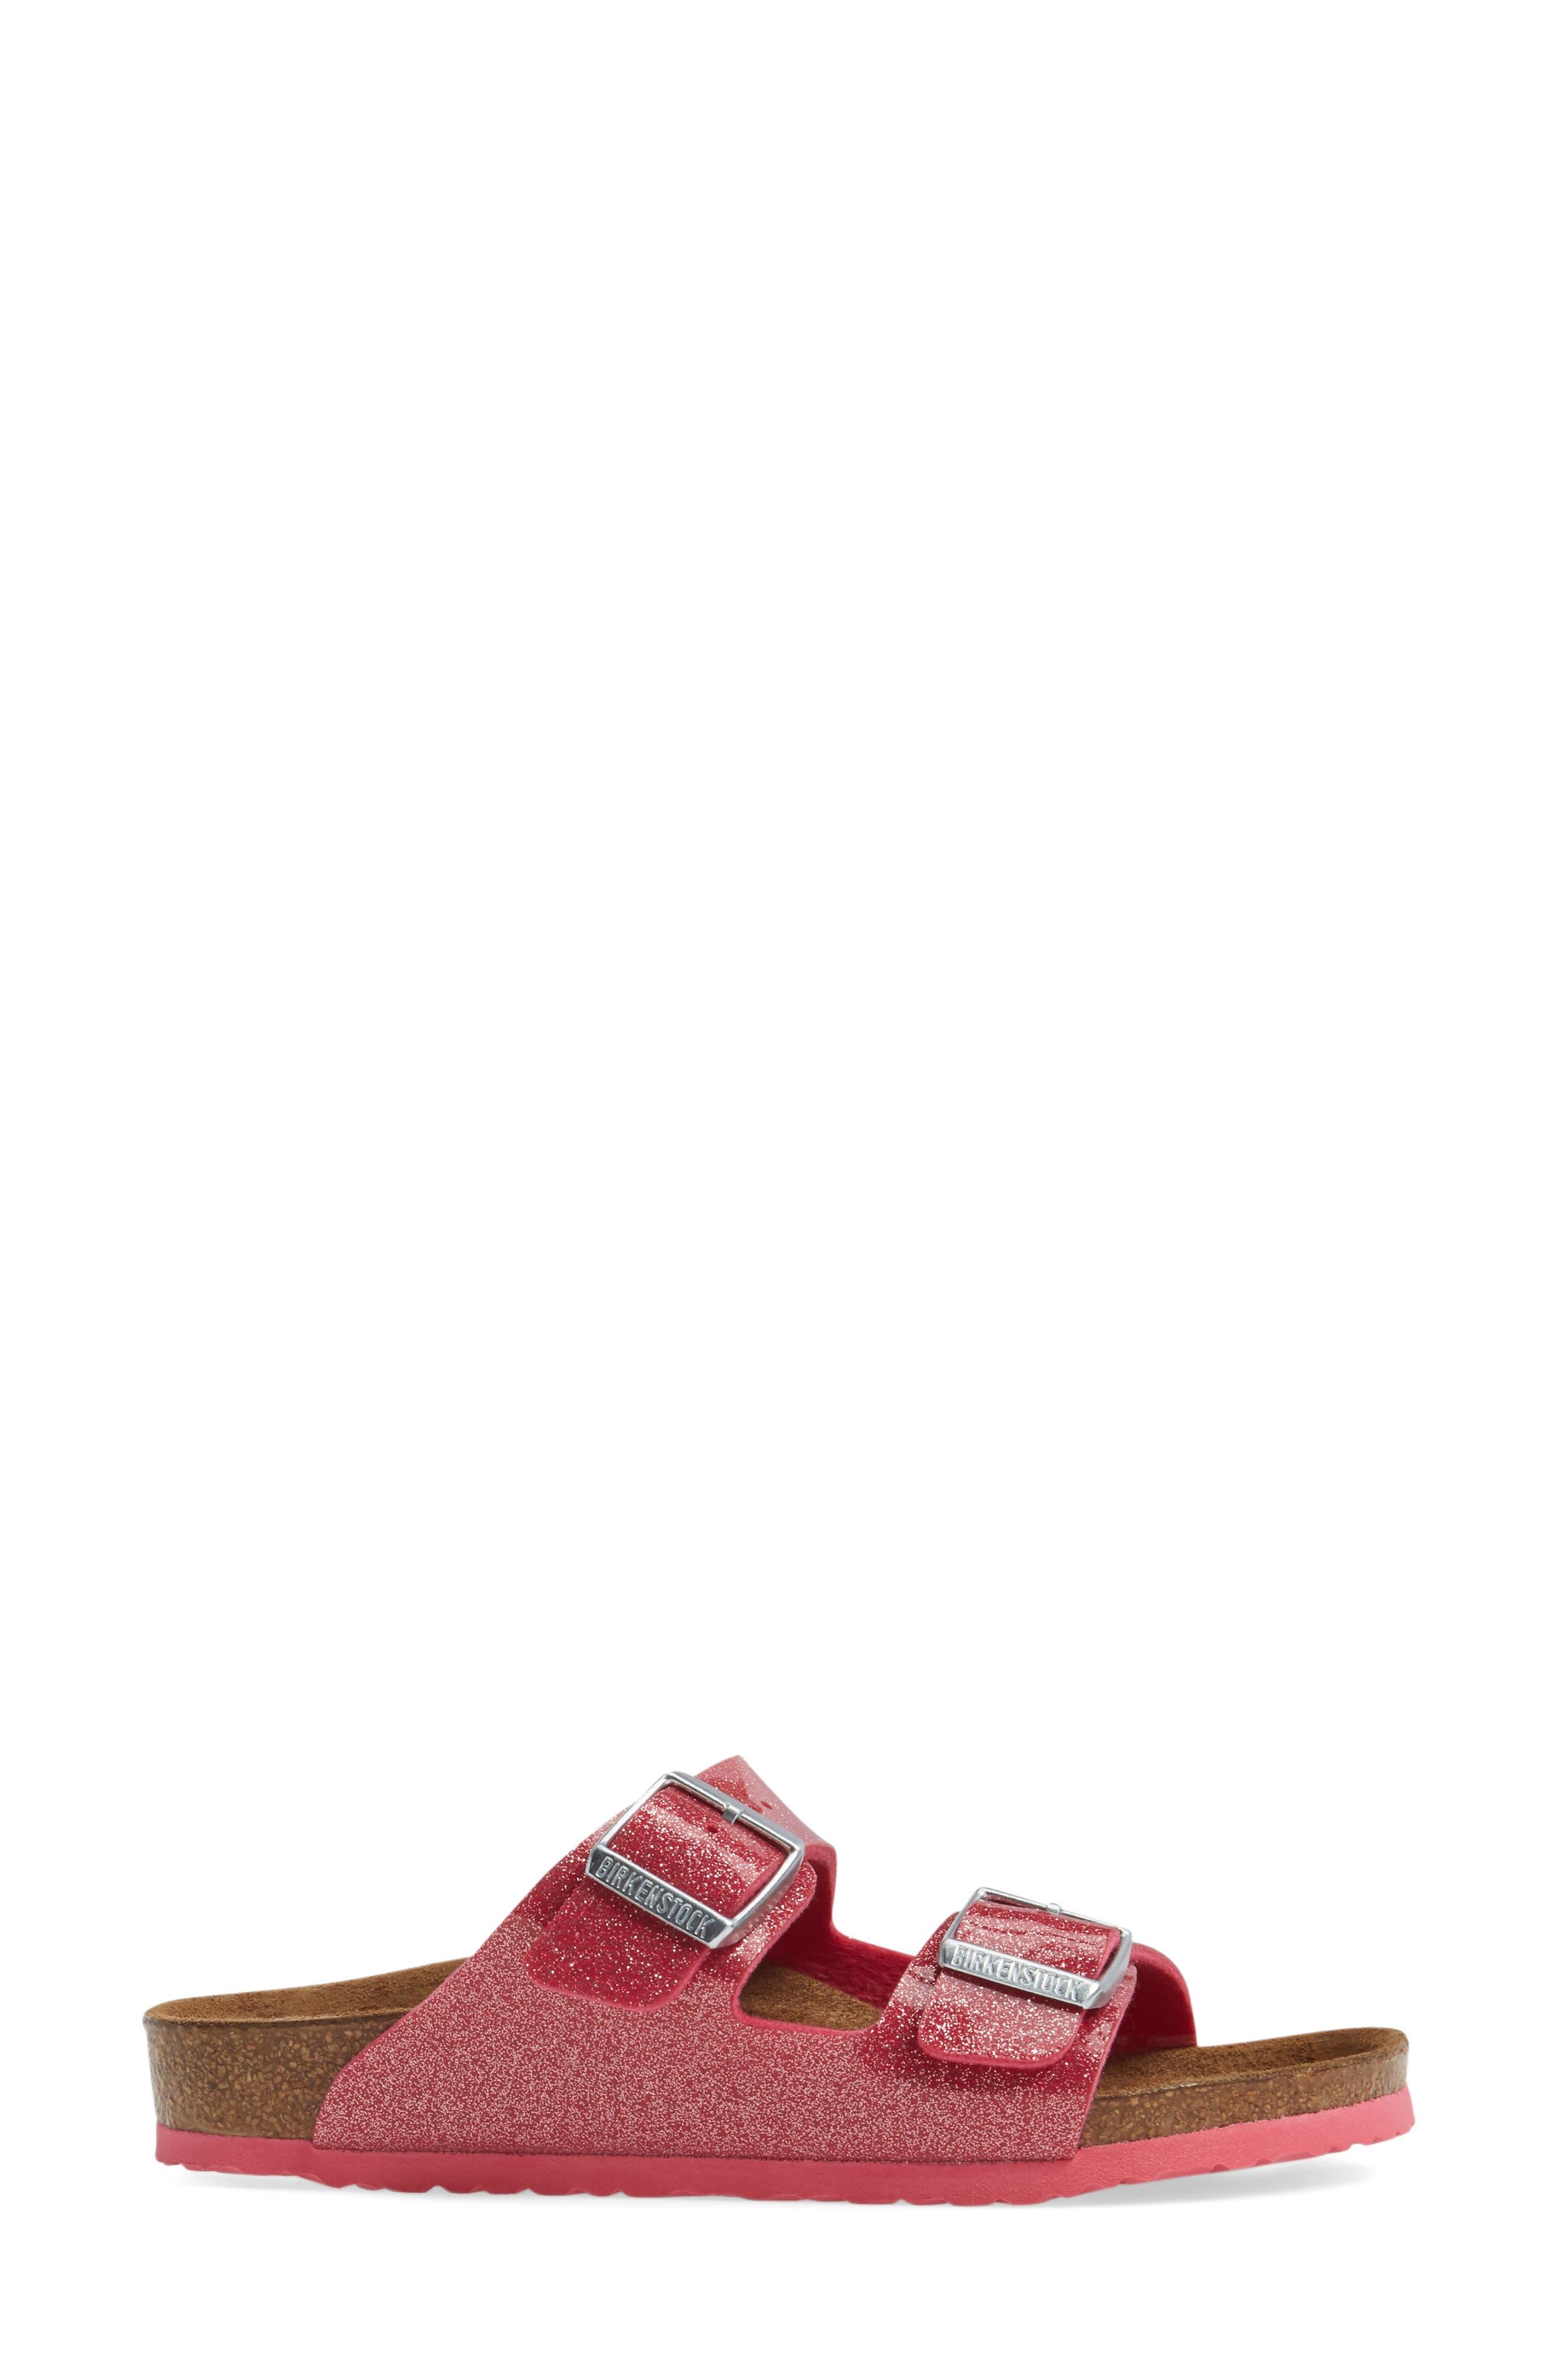 'Arizona Galaxy Birko-Flor' Slide Sandal,                             Alternate thumbnail 12, color,